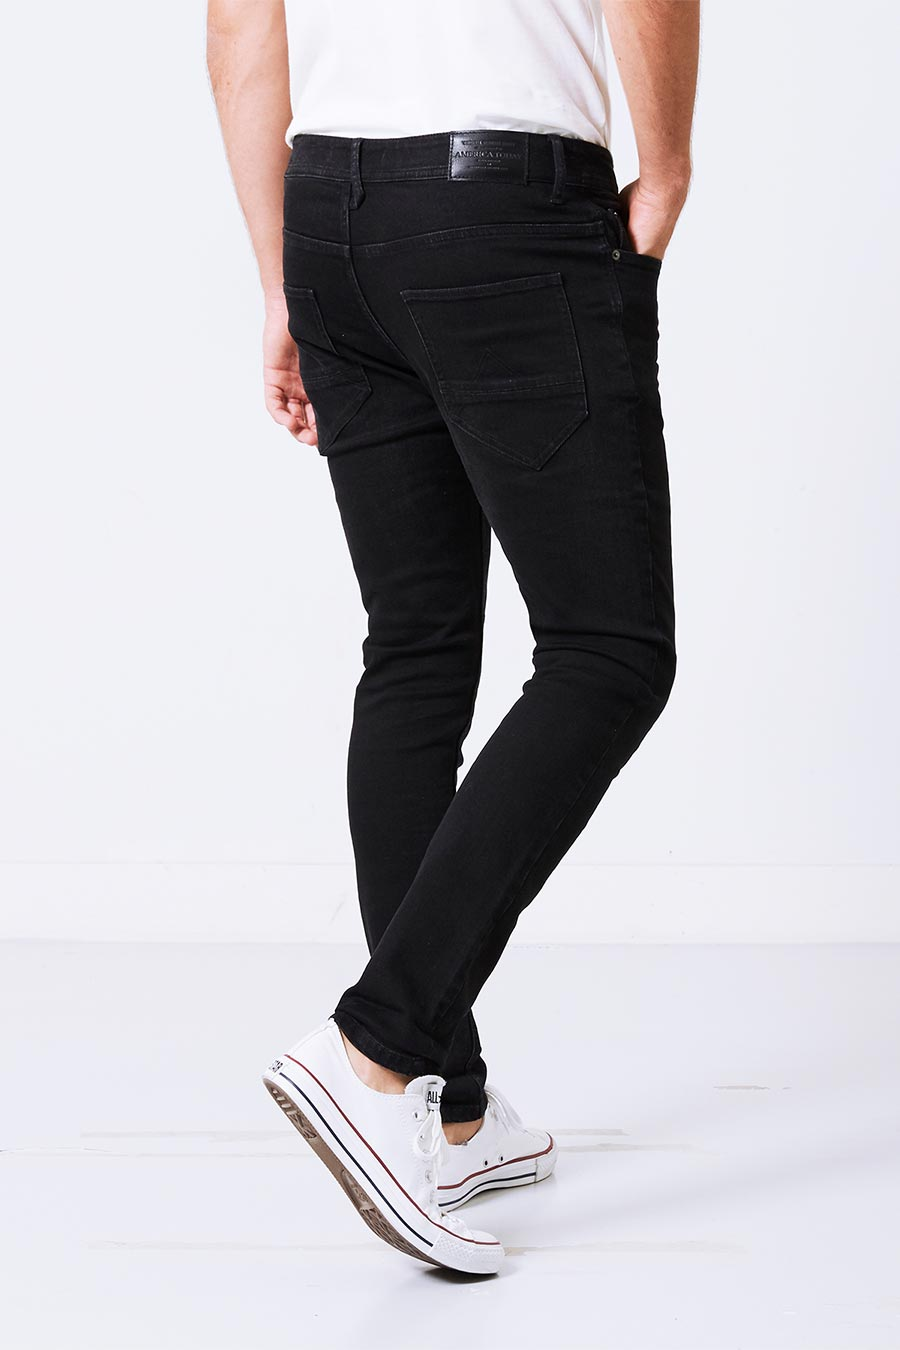 ryan men Jeans alt